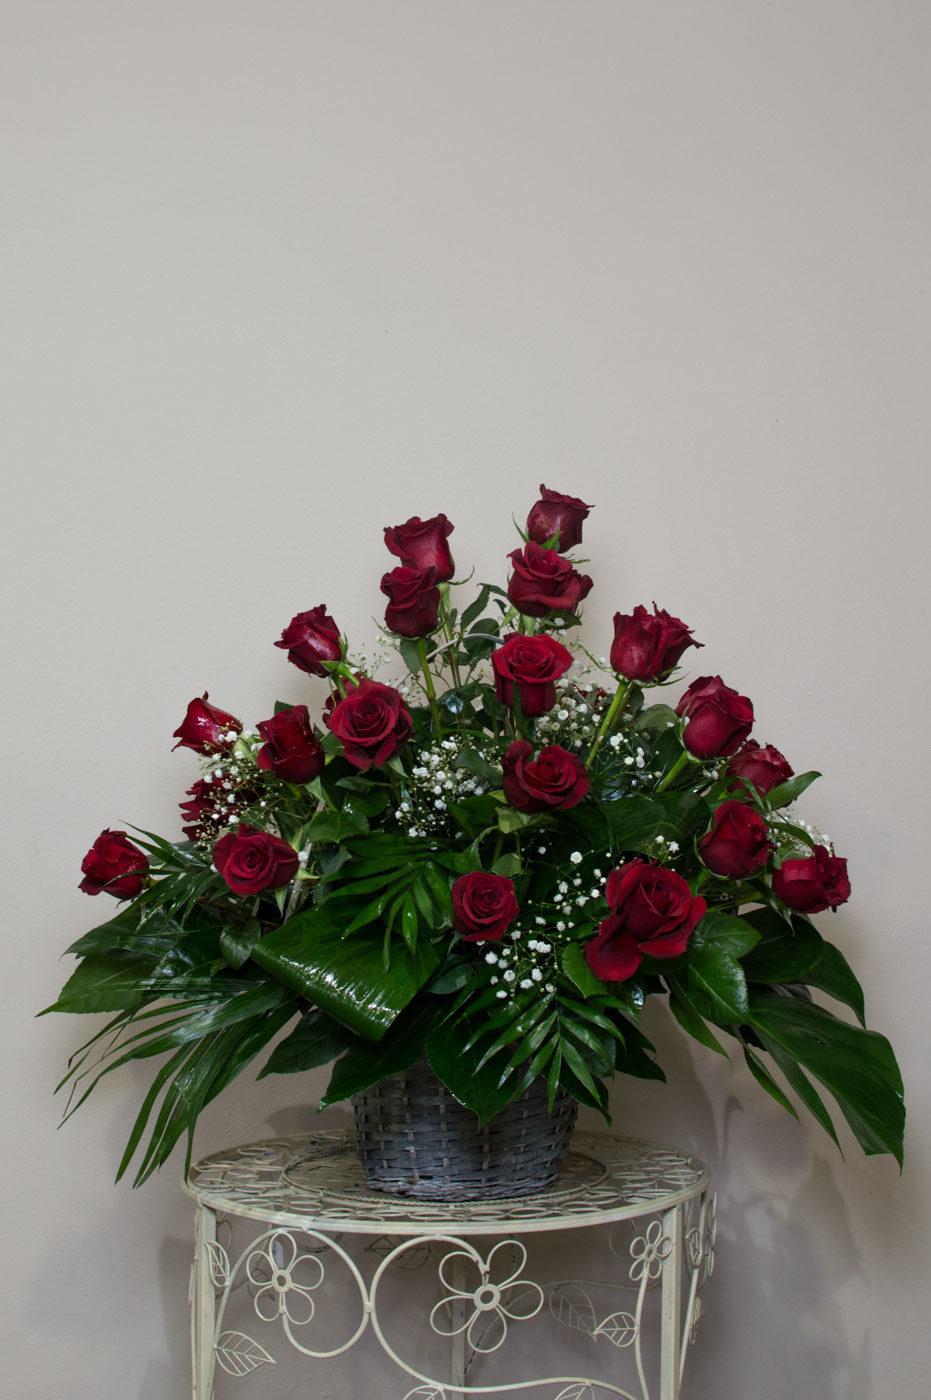 Cesta de rosas - Funeraria La Paz Verín